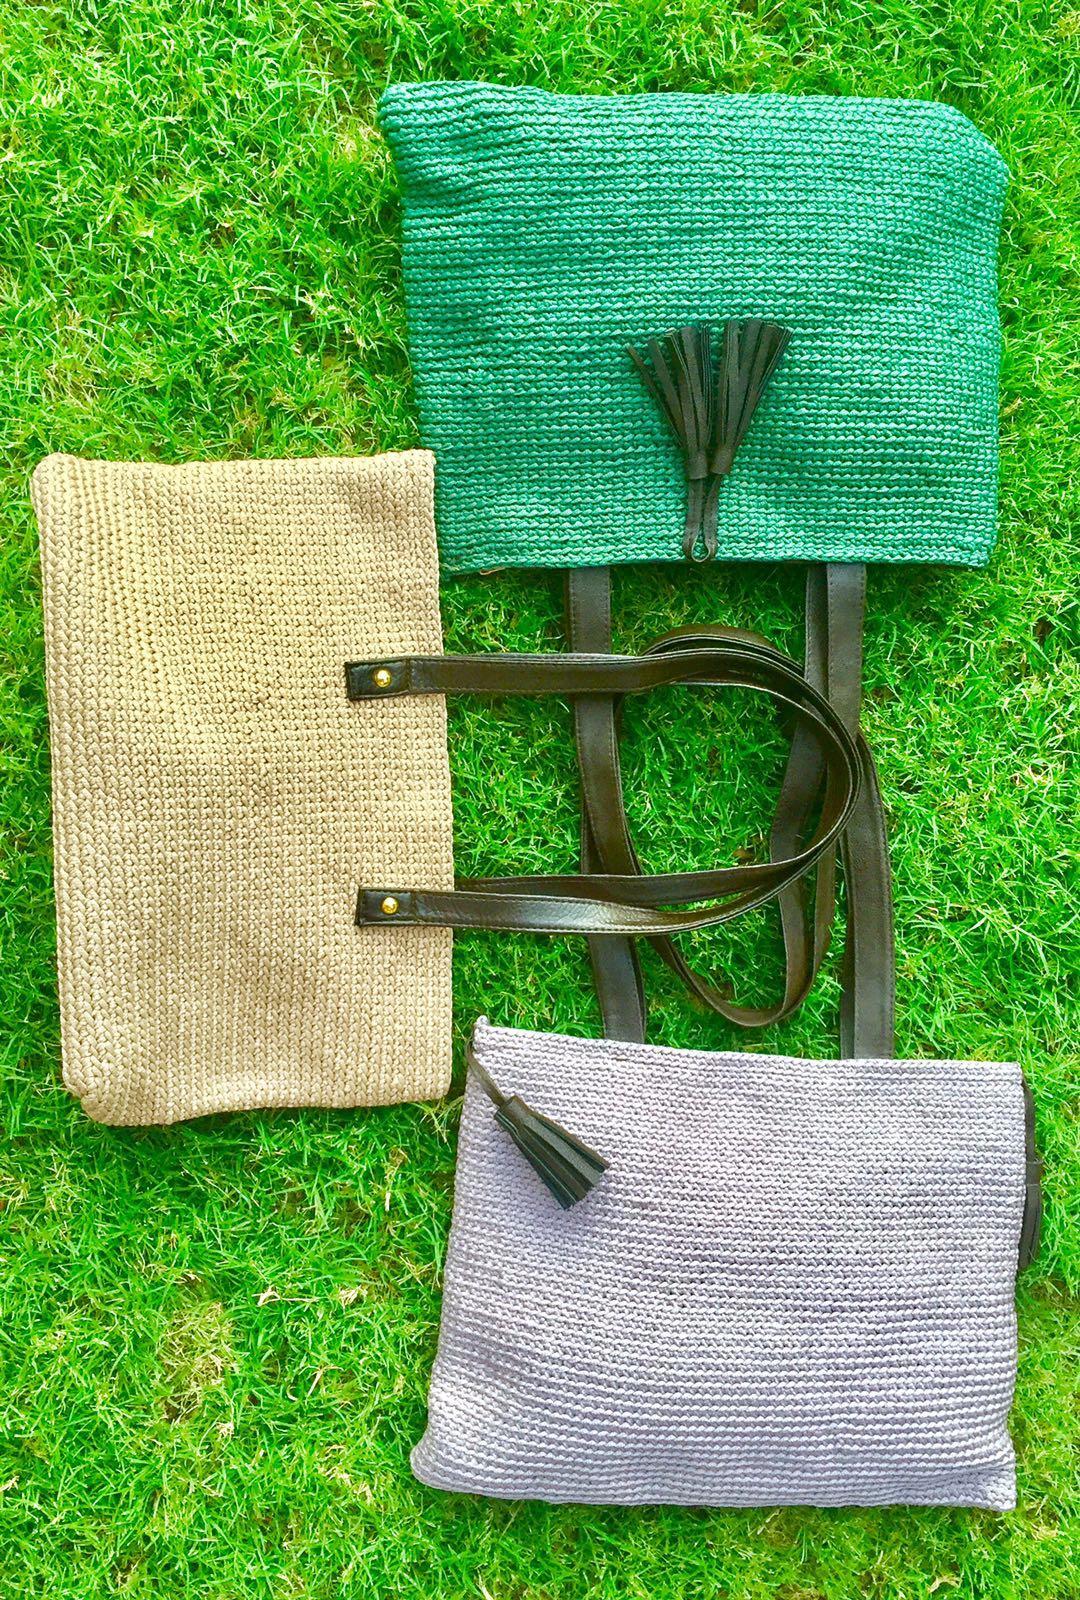 Handmade Colorful Bags